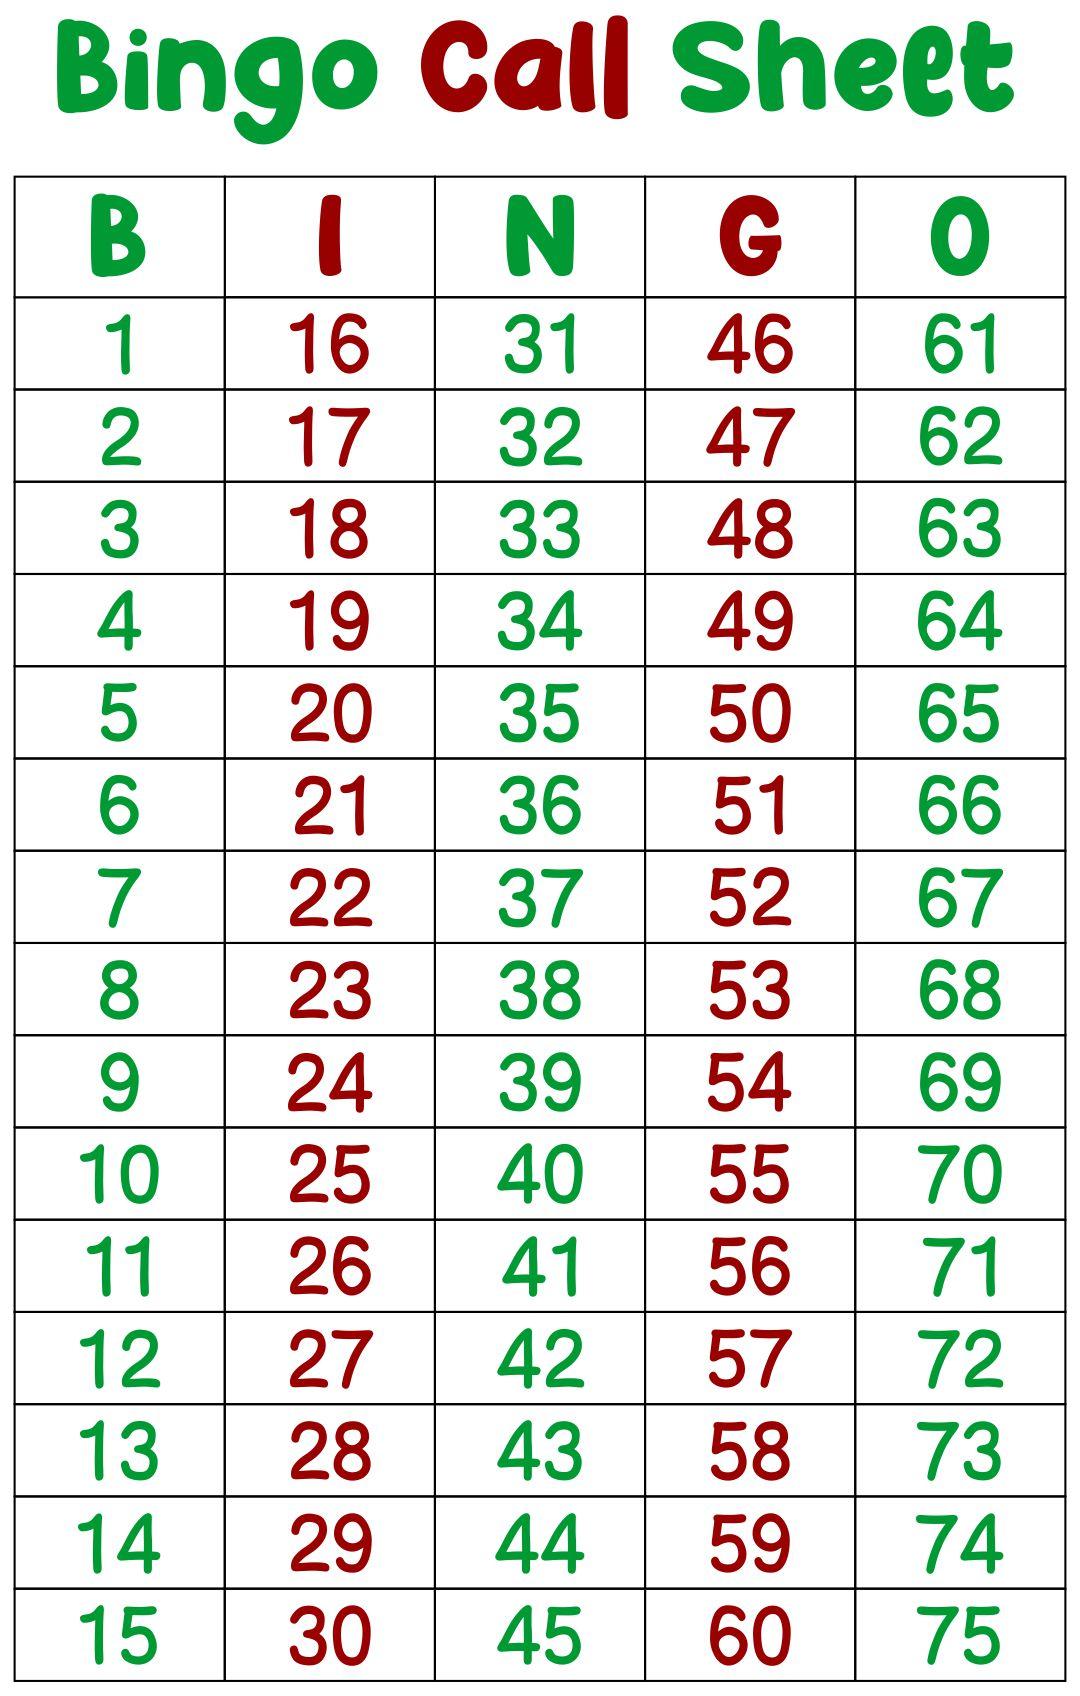 Printable Bingo Call Sheet